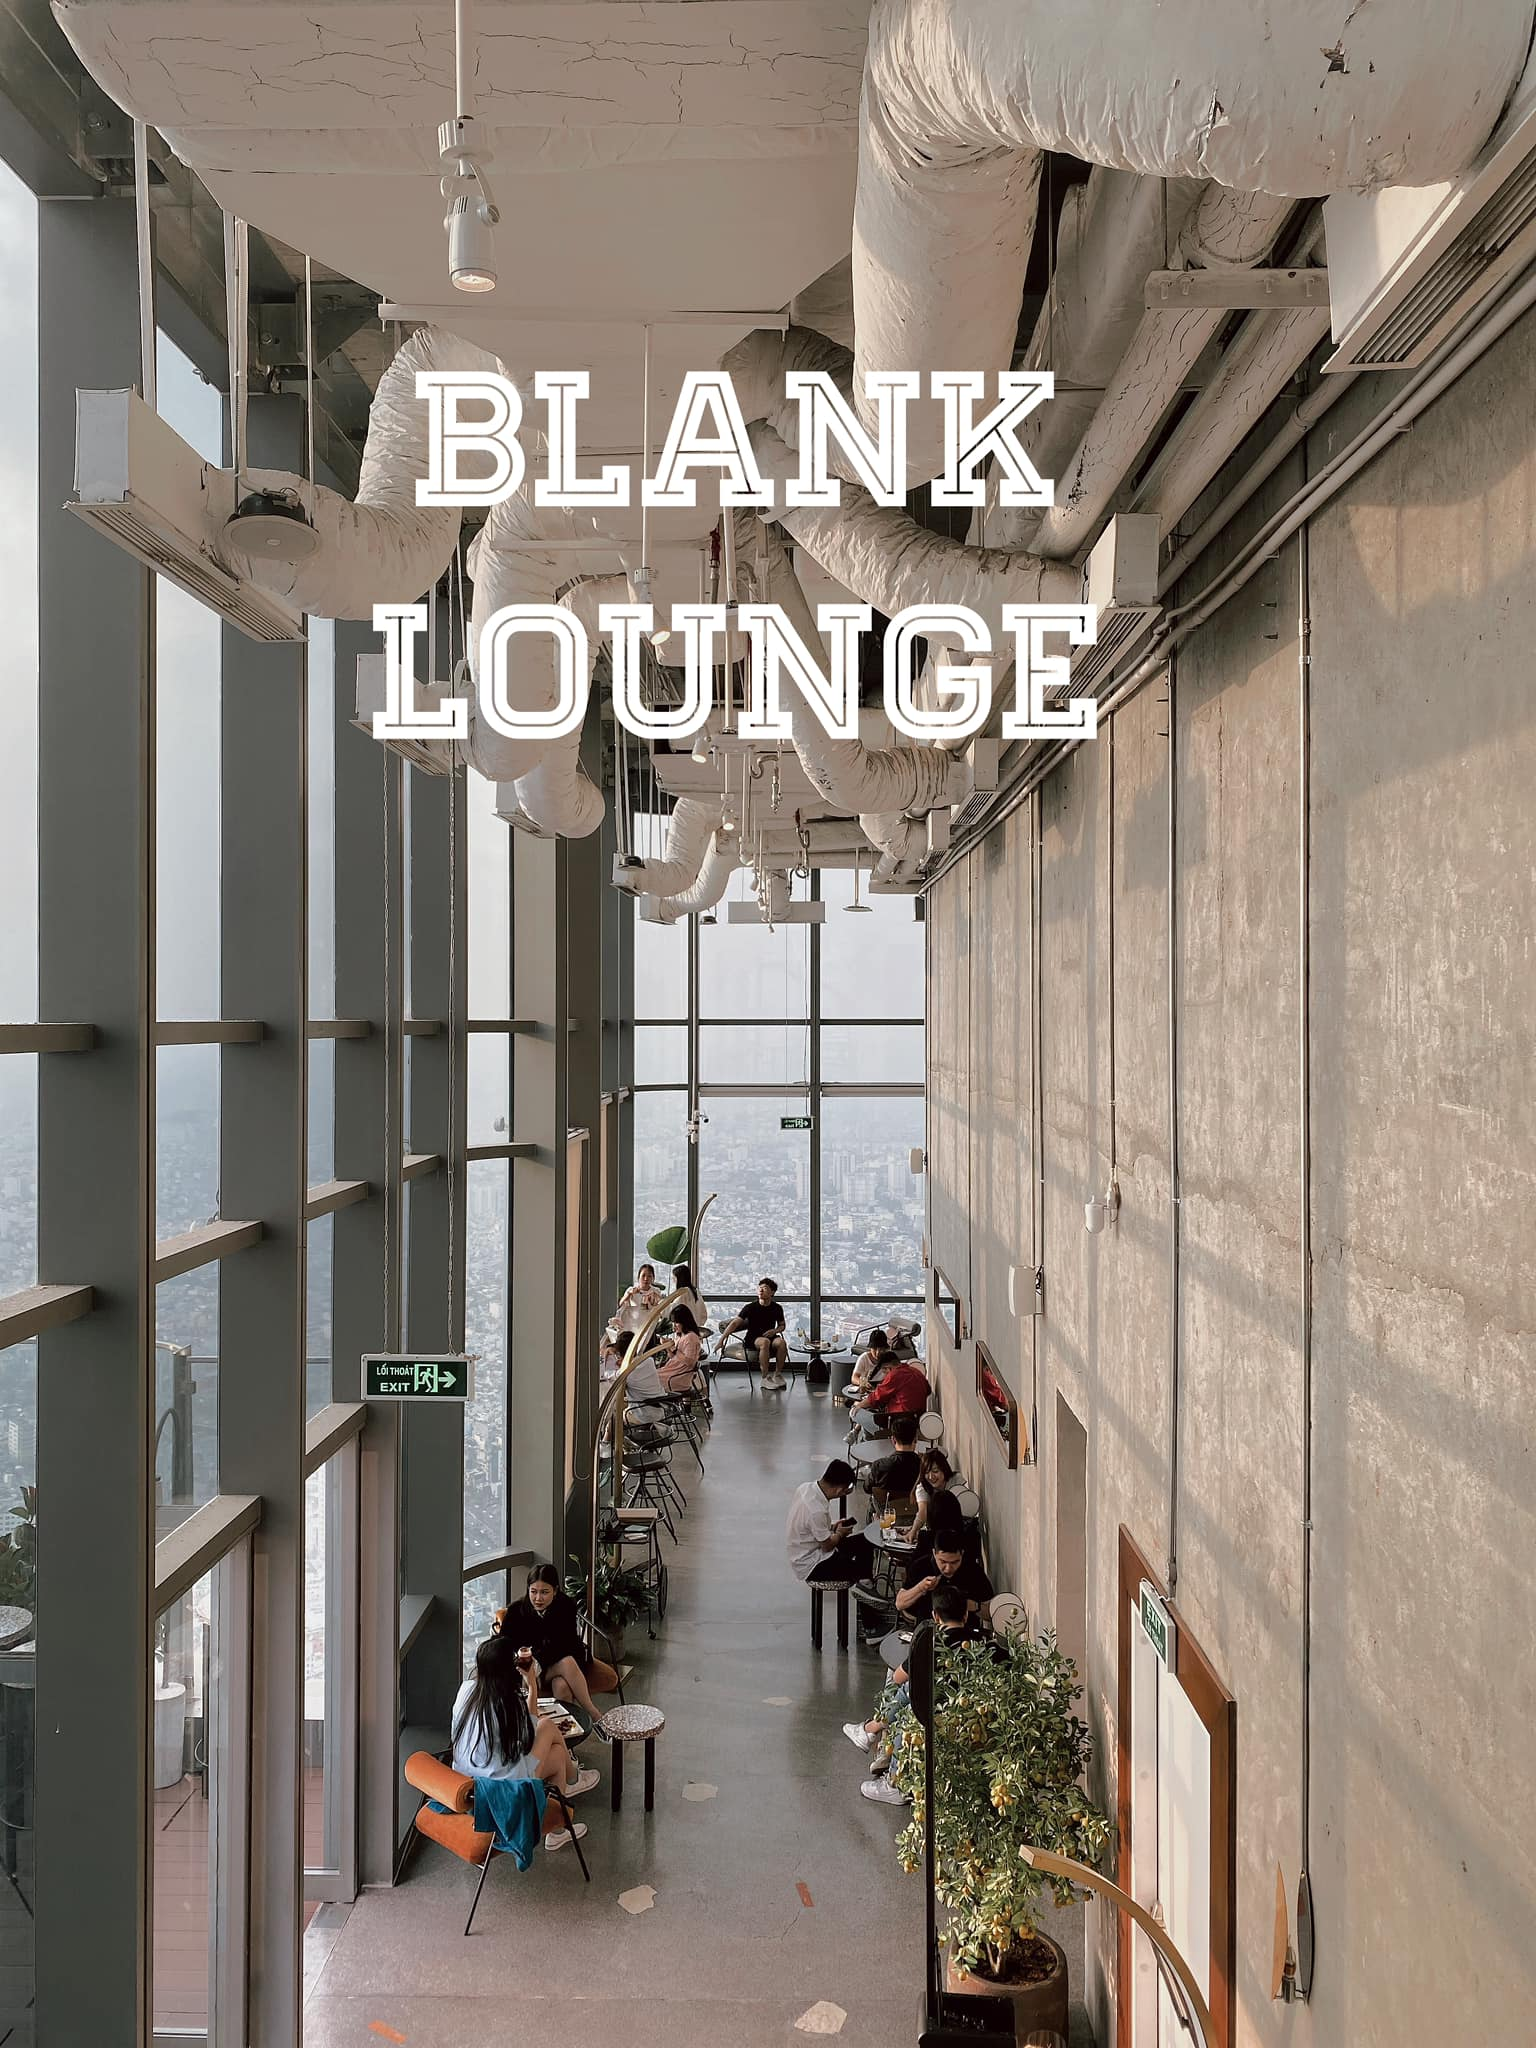 Blank Lounge - Quán cafe trên tầng cao Landmark 81